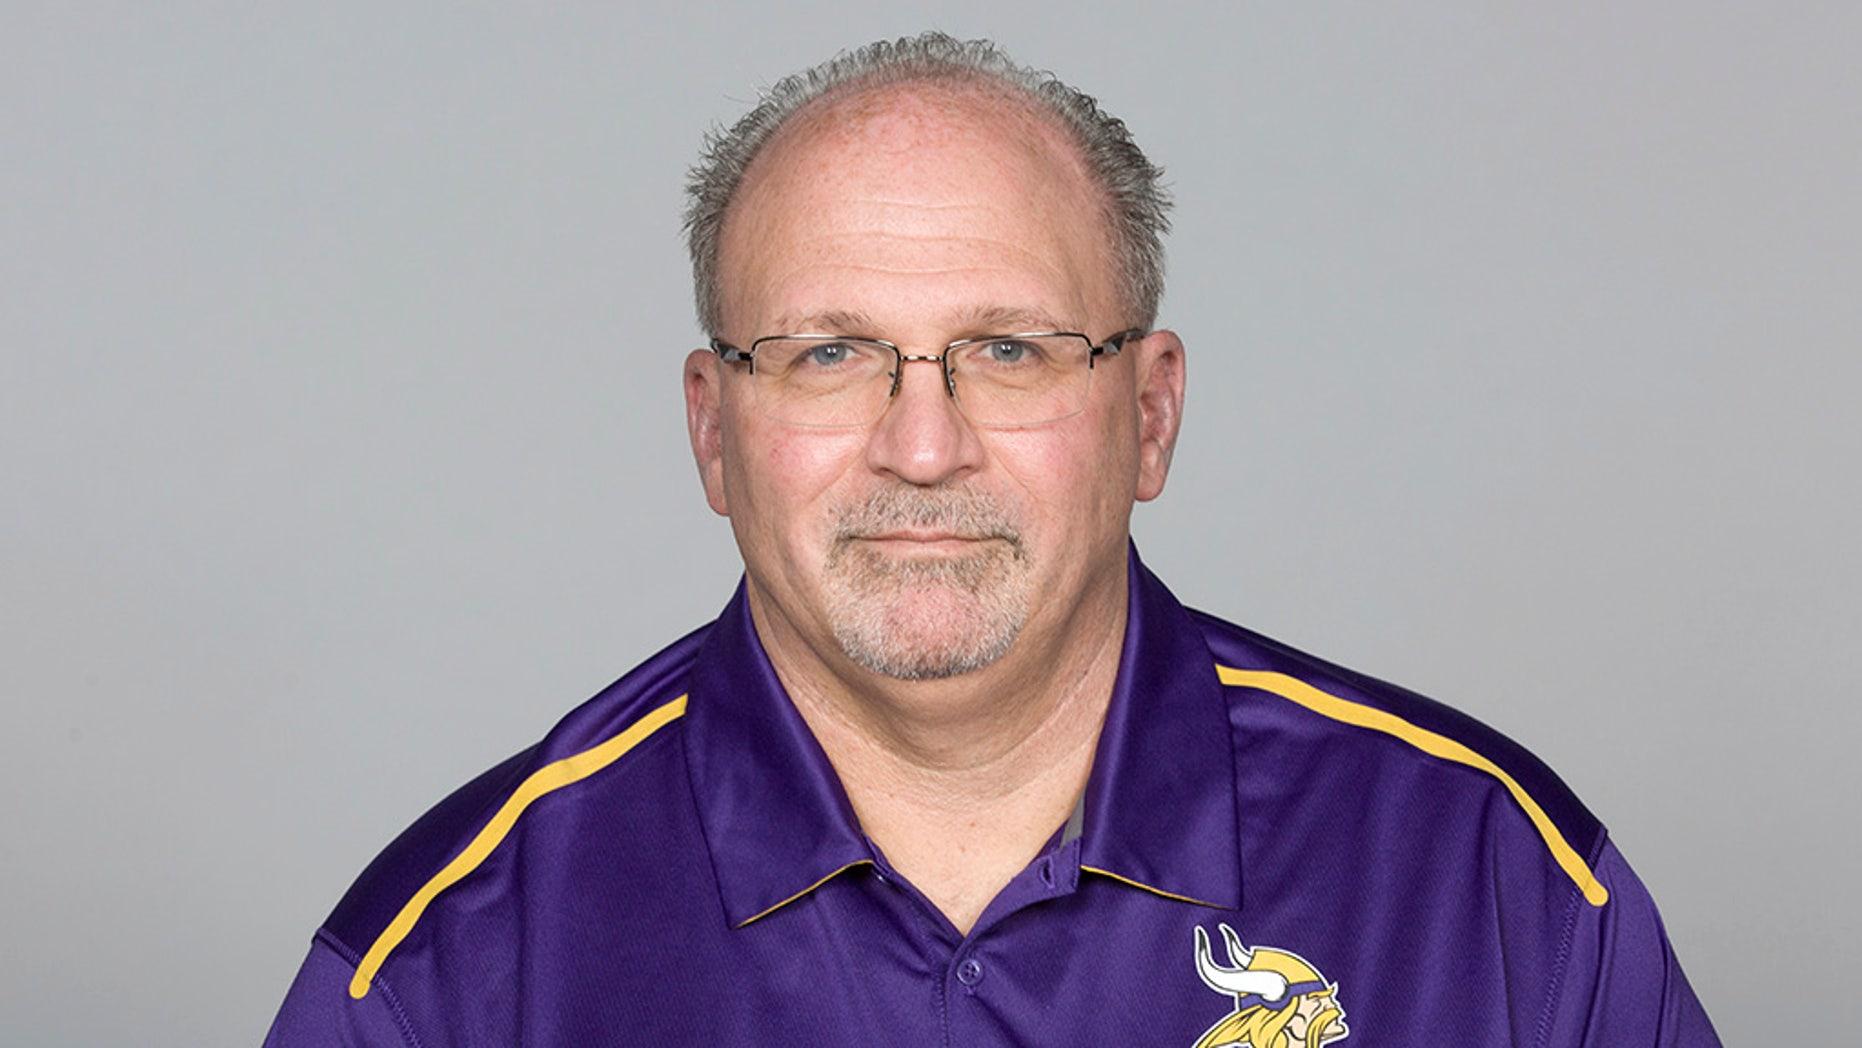 Tony Sparano was entering his third season as Minnesota Vikings offensive line coach.